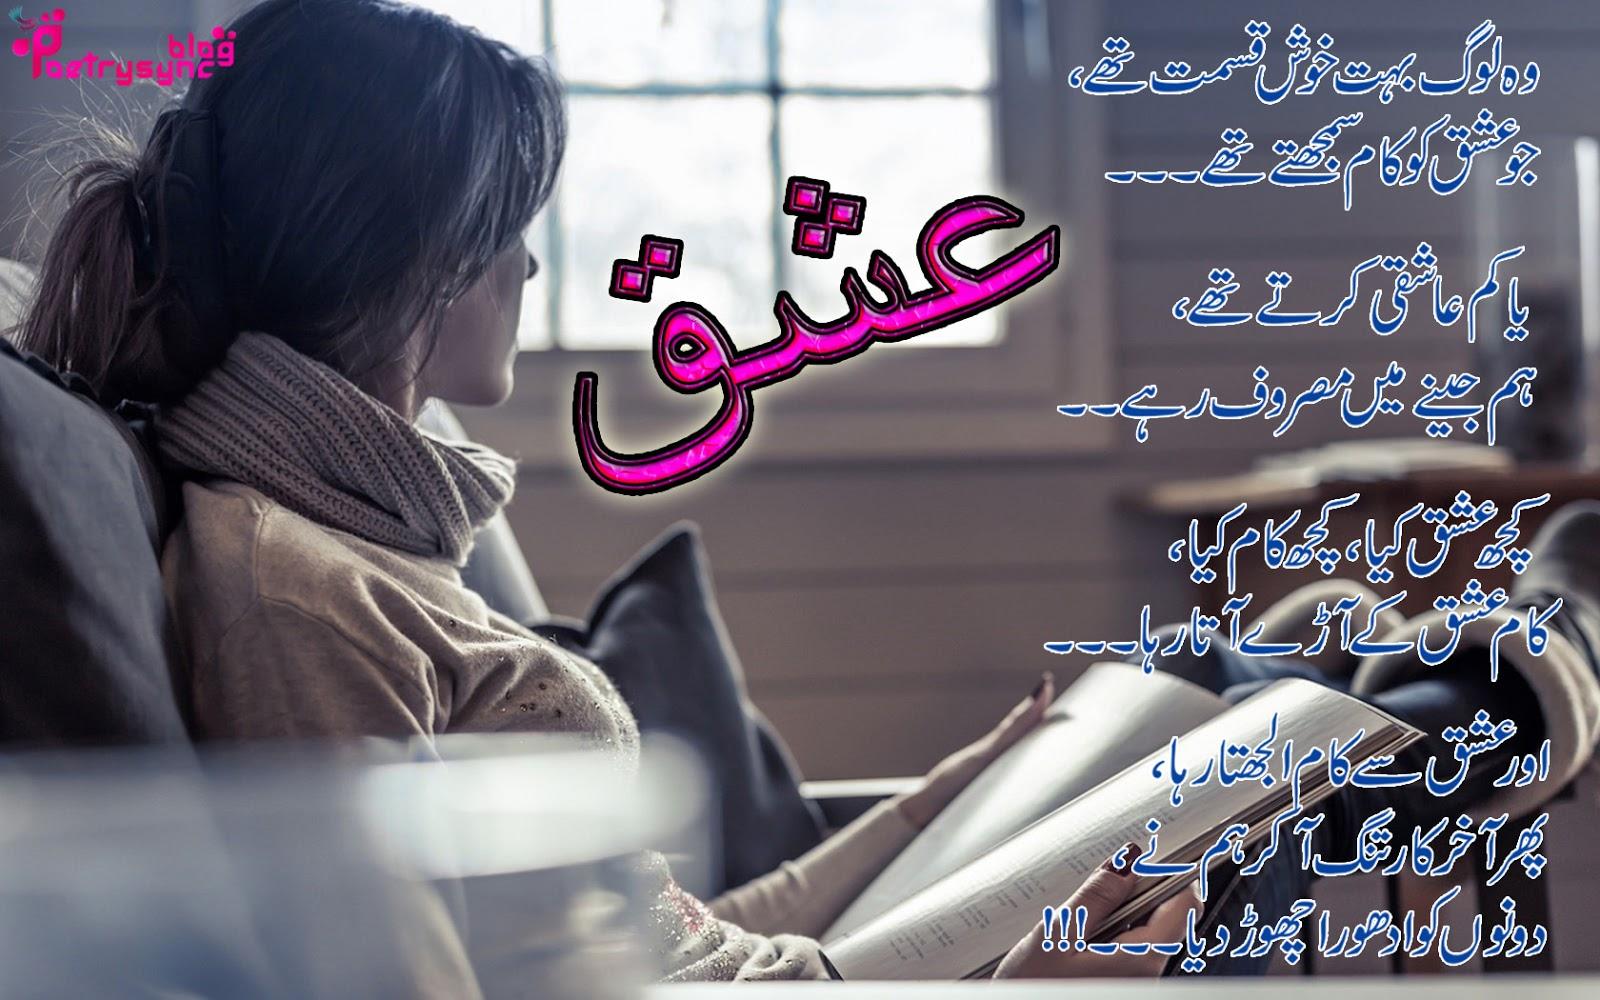 Talb-e-ishq mittaa di hum ne.. Ranjish.com |Ishq Poetry